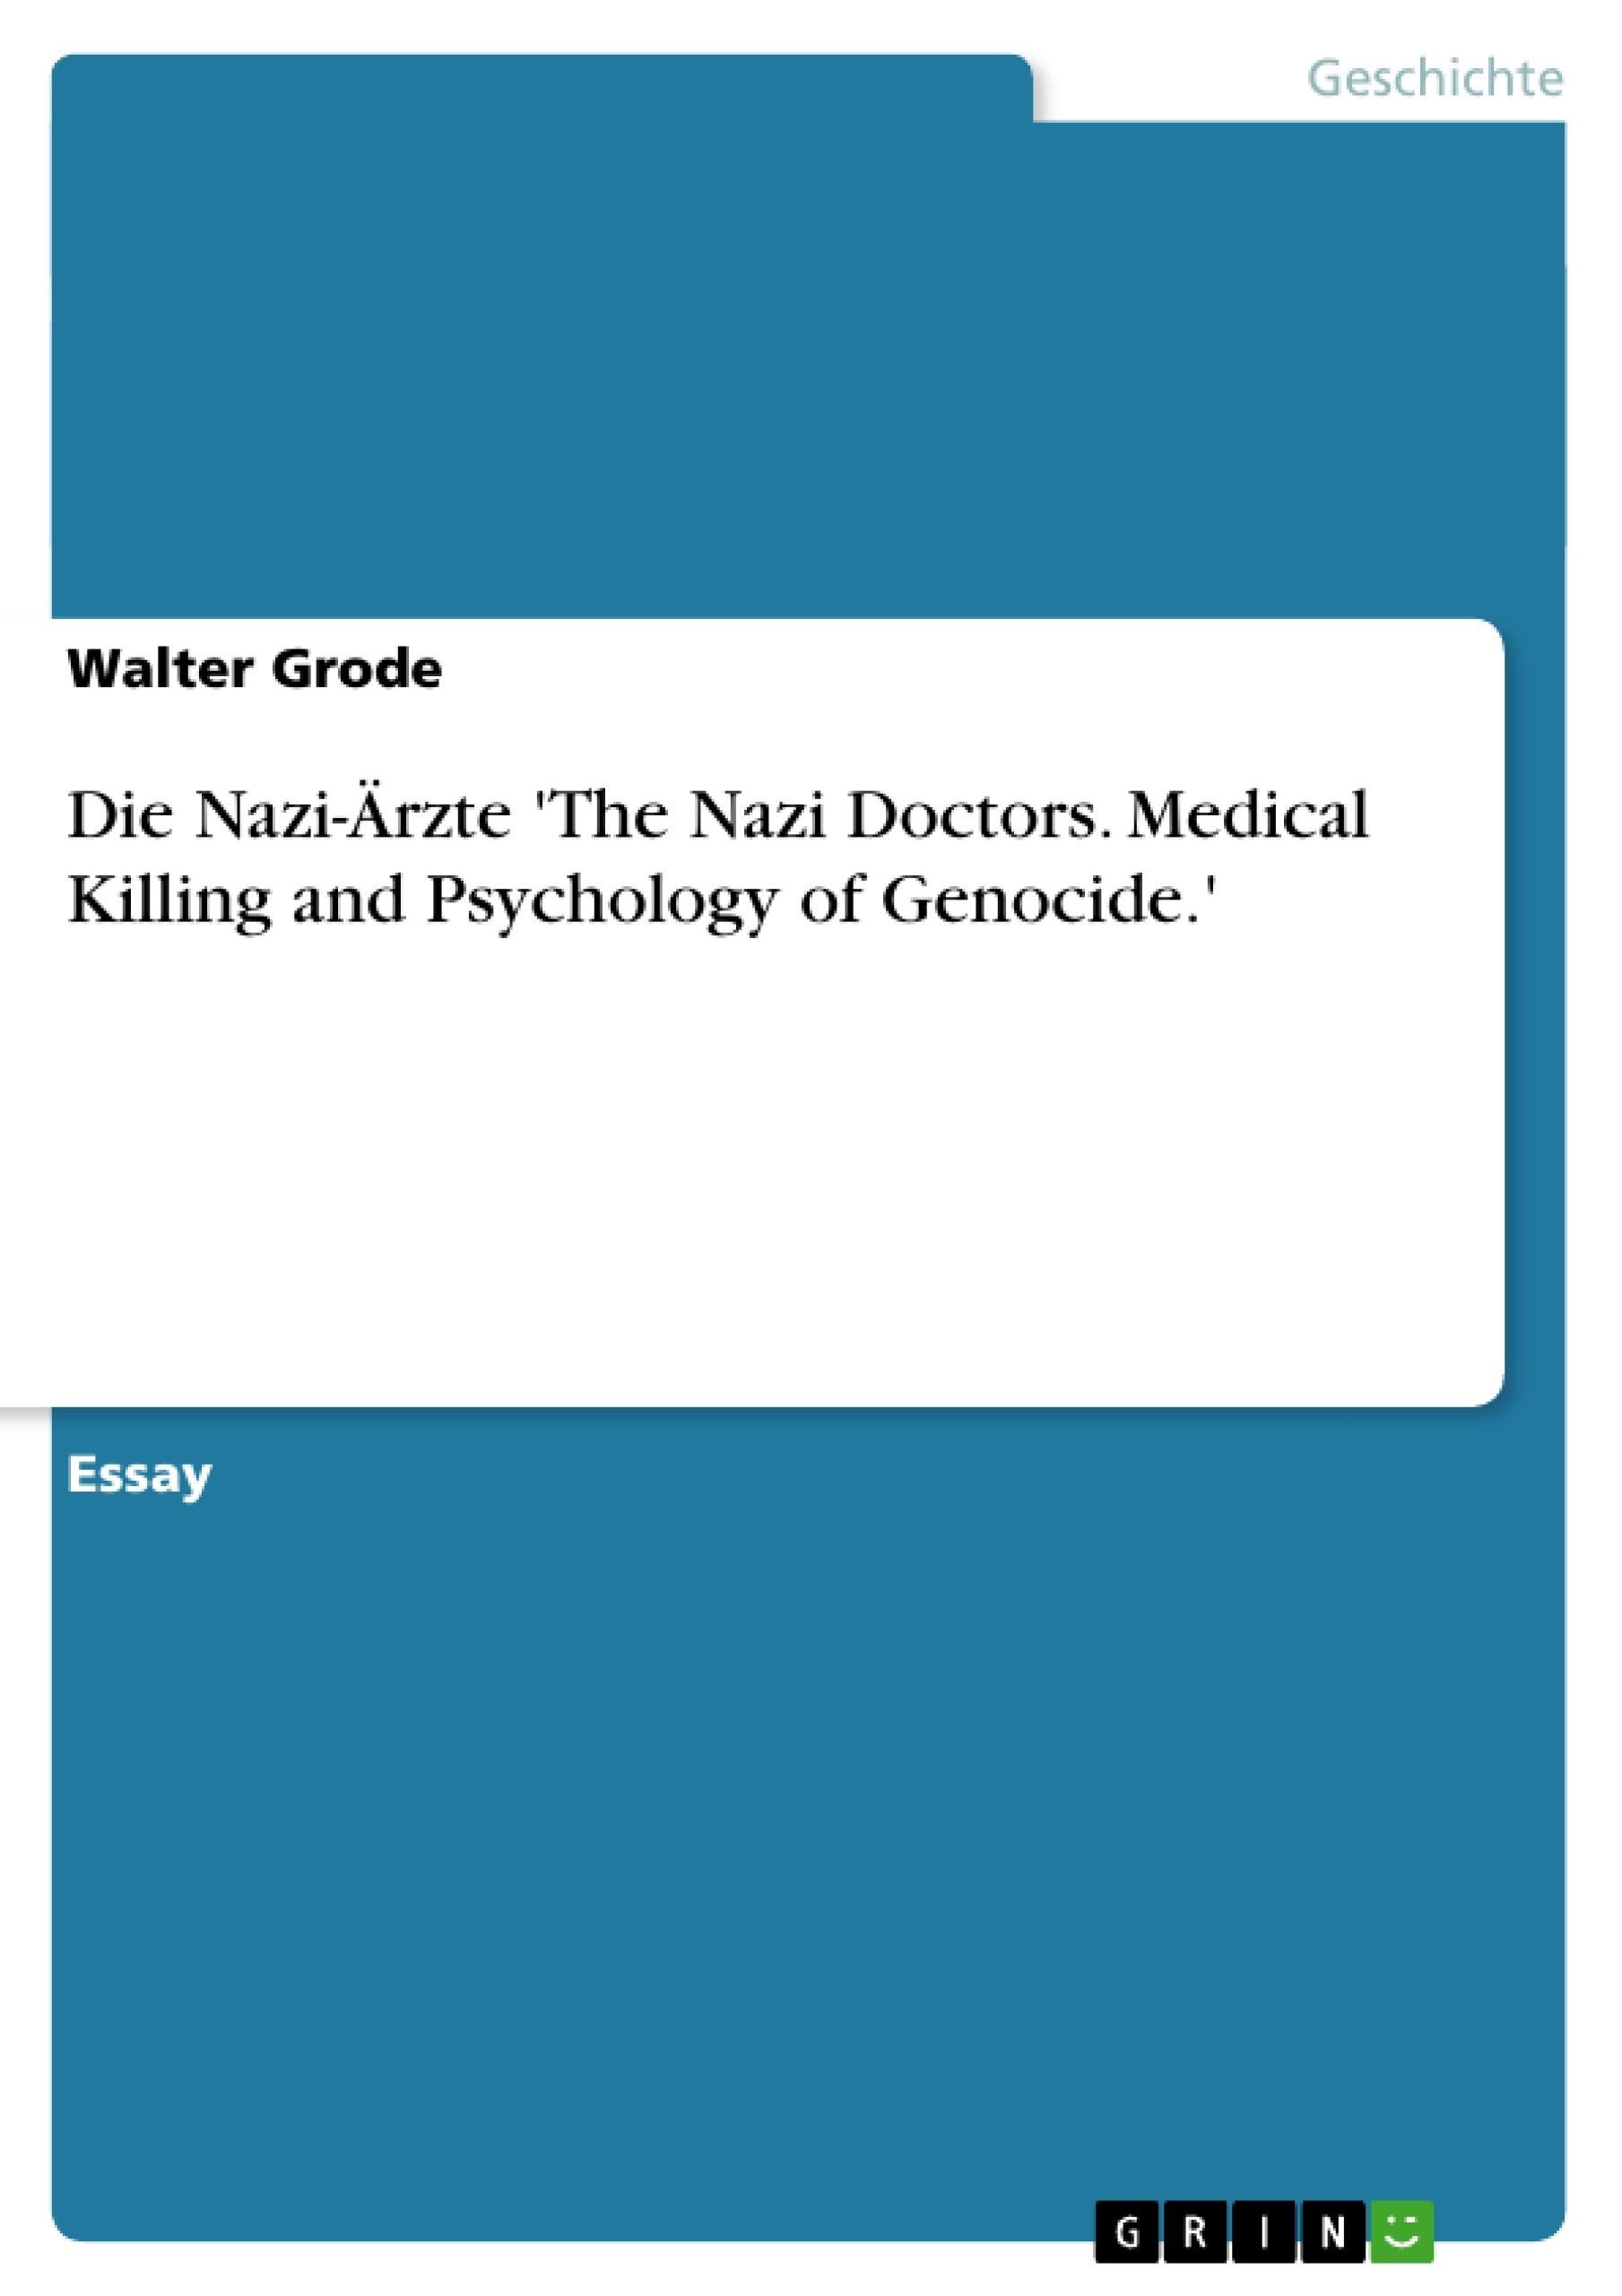 Titel: Die Nazi-Ärzte 'The Nazi Doctors.  Medical Killing   and Psychology of  Genocide.'